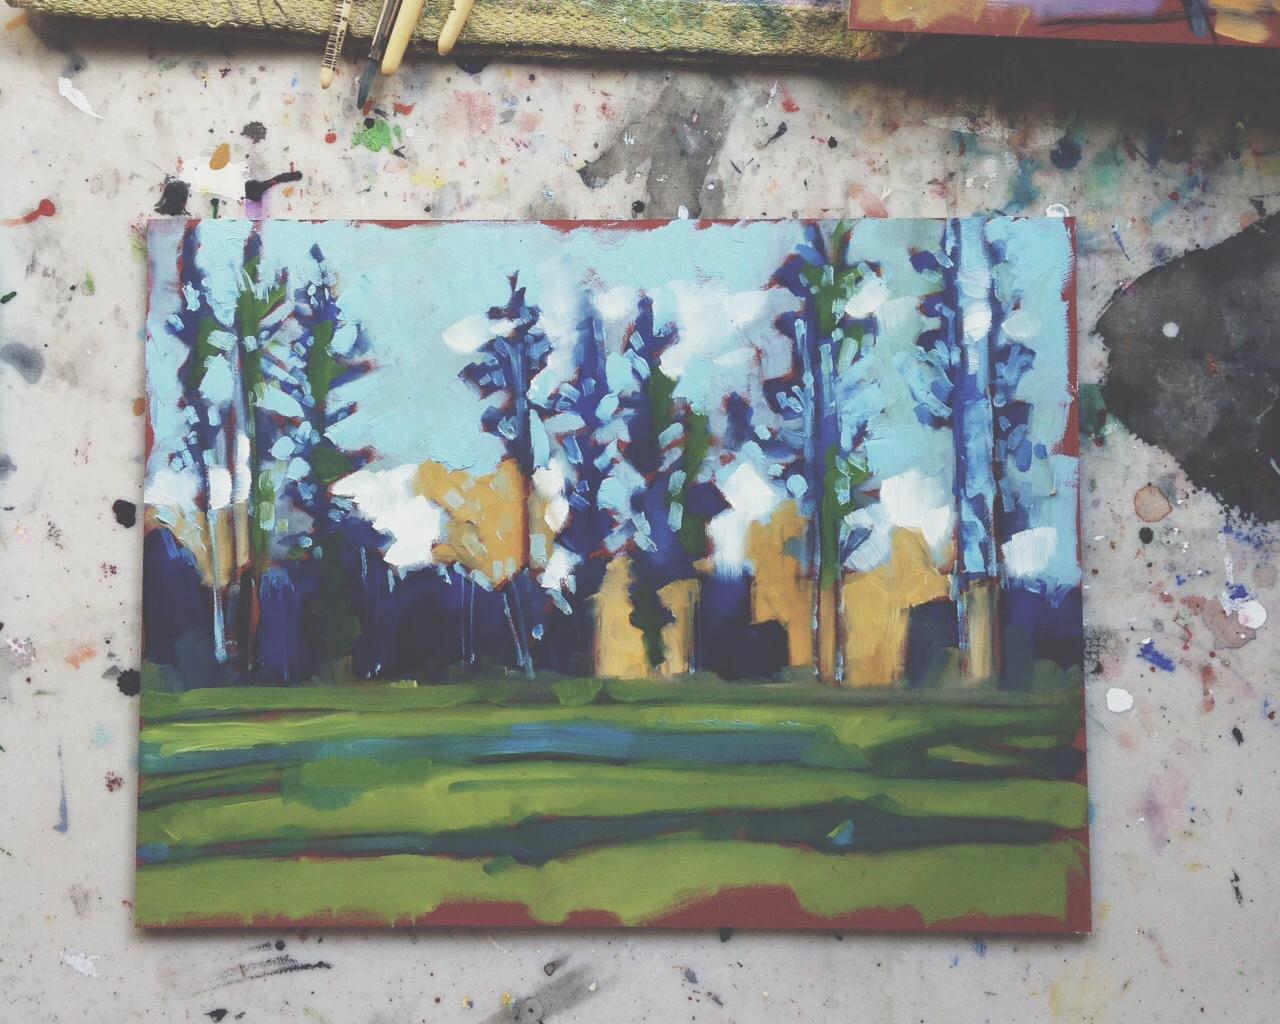 long shadows, tall pines, Whitehorse YT, oil on masonite, 9x12, 2015